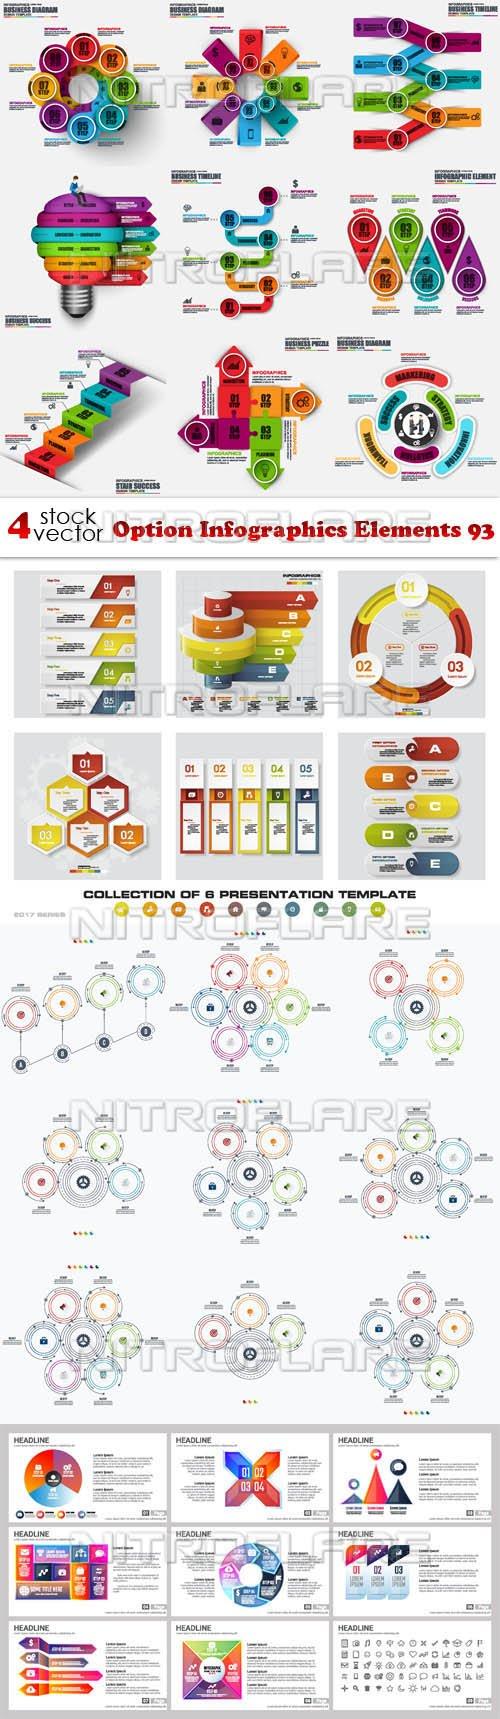 Vectors - Option Infographics Elements 93